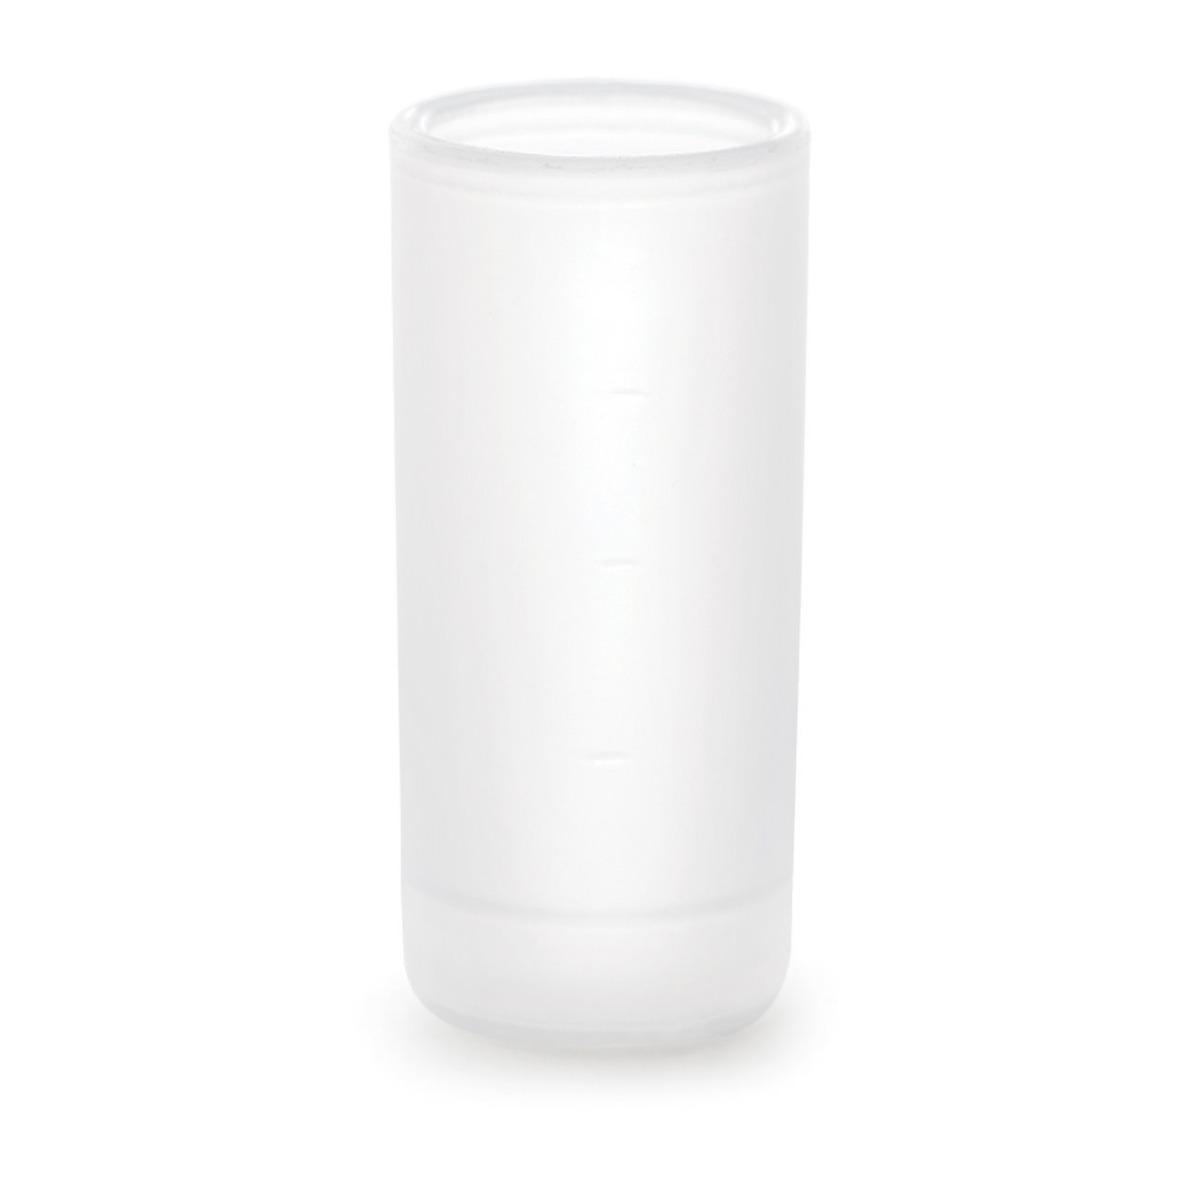 Transparent Protective Cap for DO Probes - HI740211